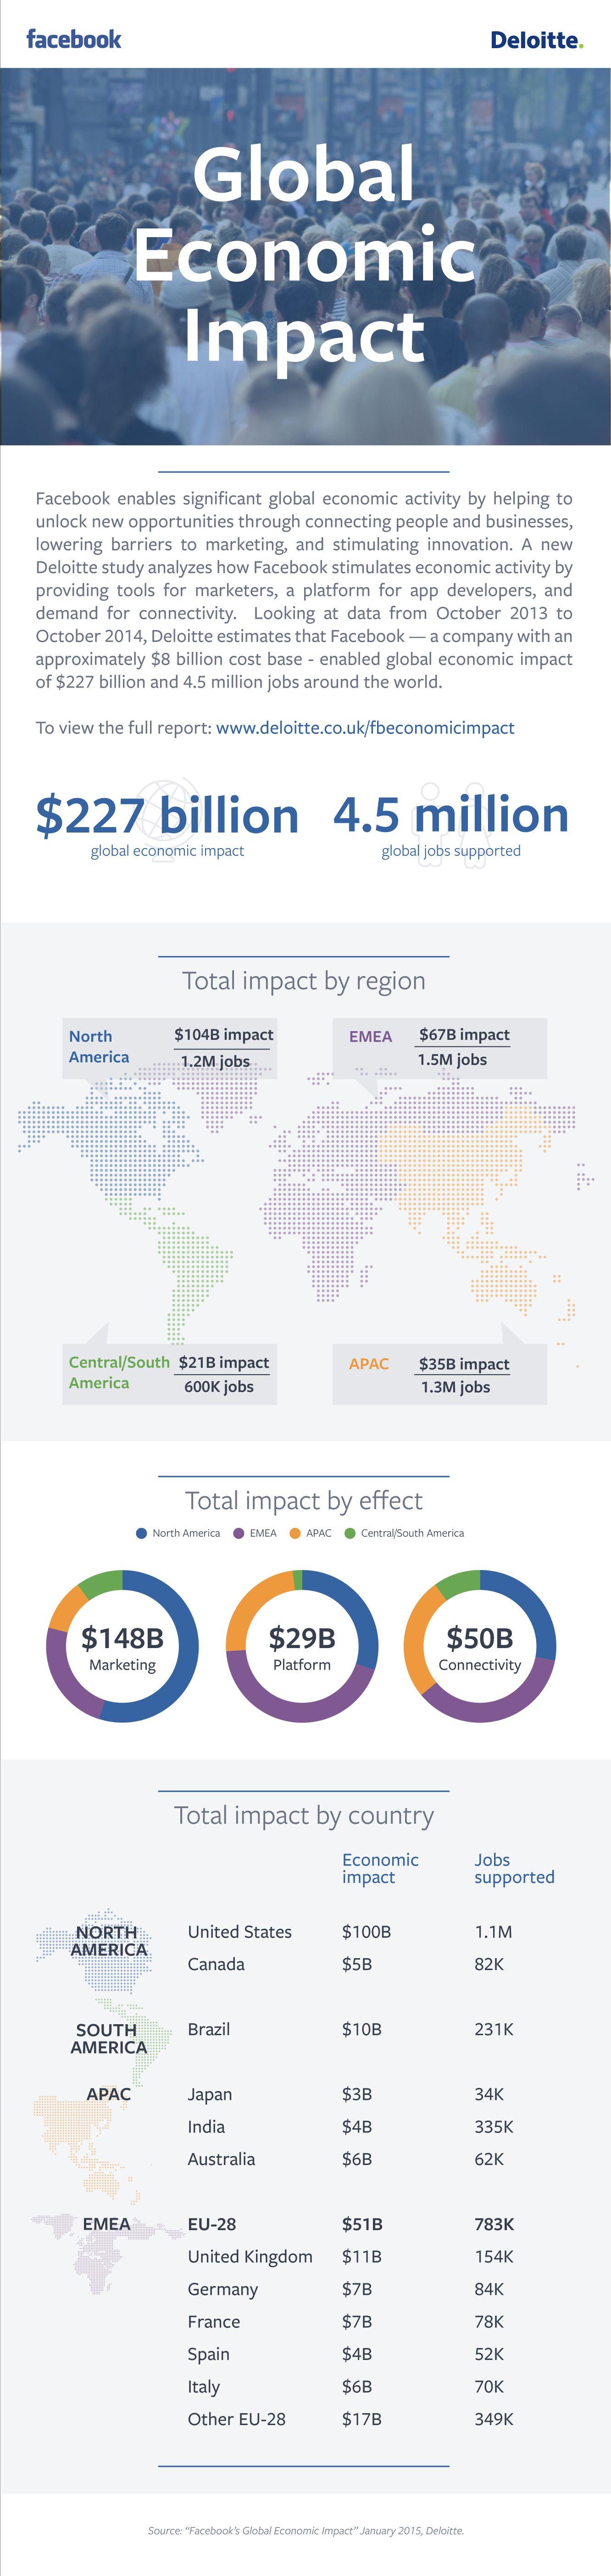 Facebook's global economic impact